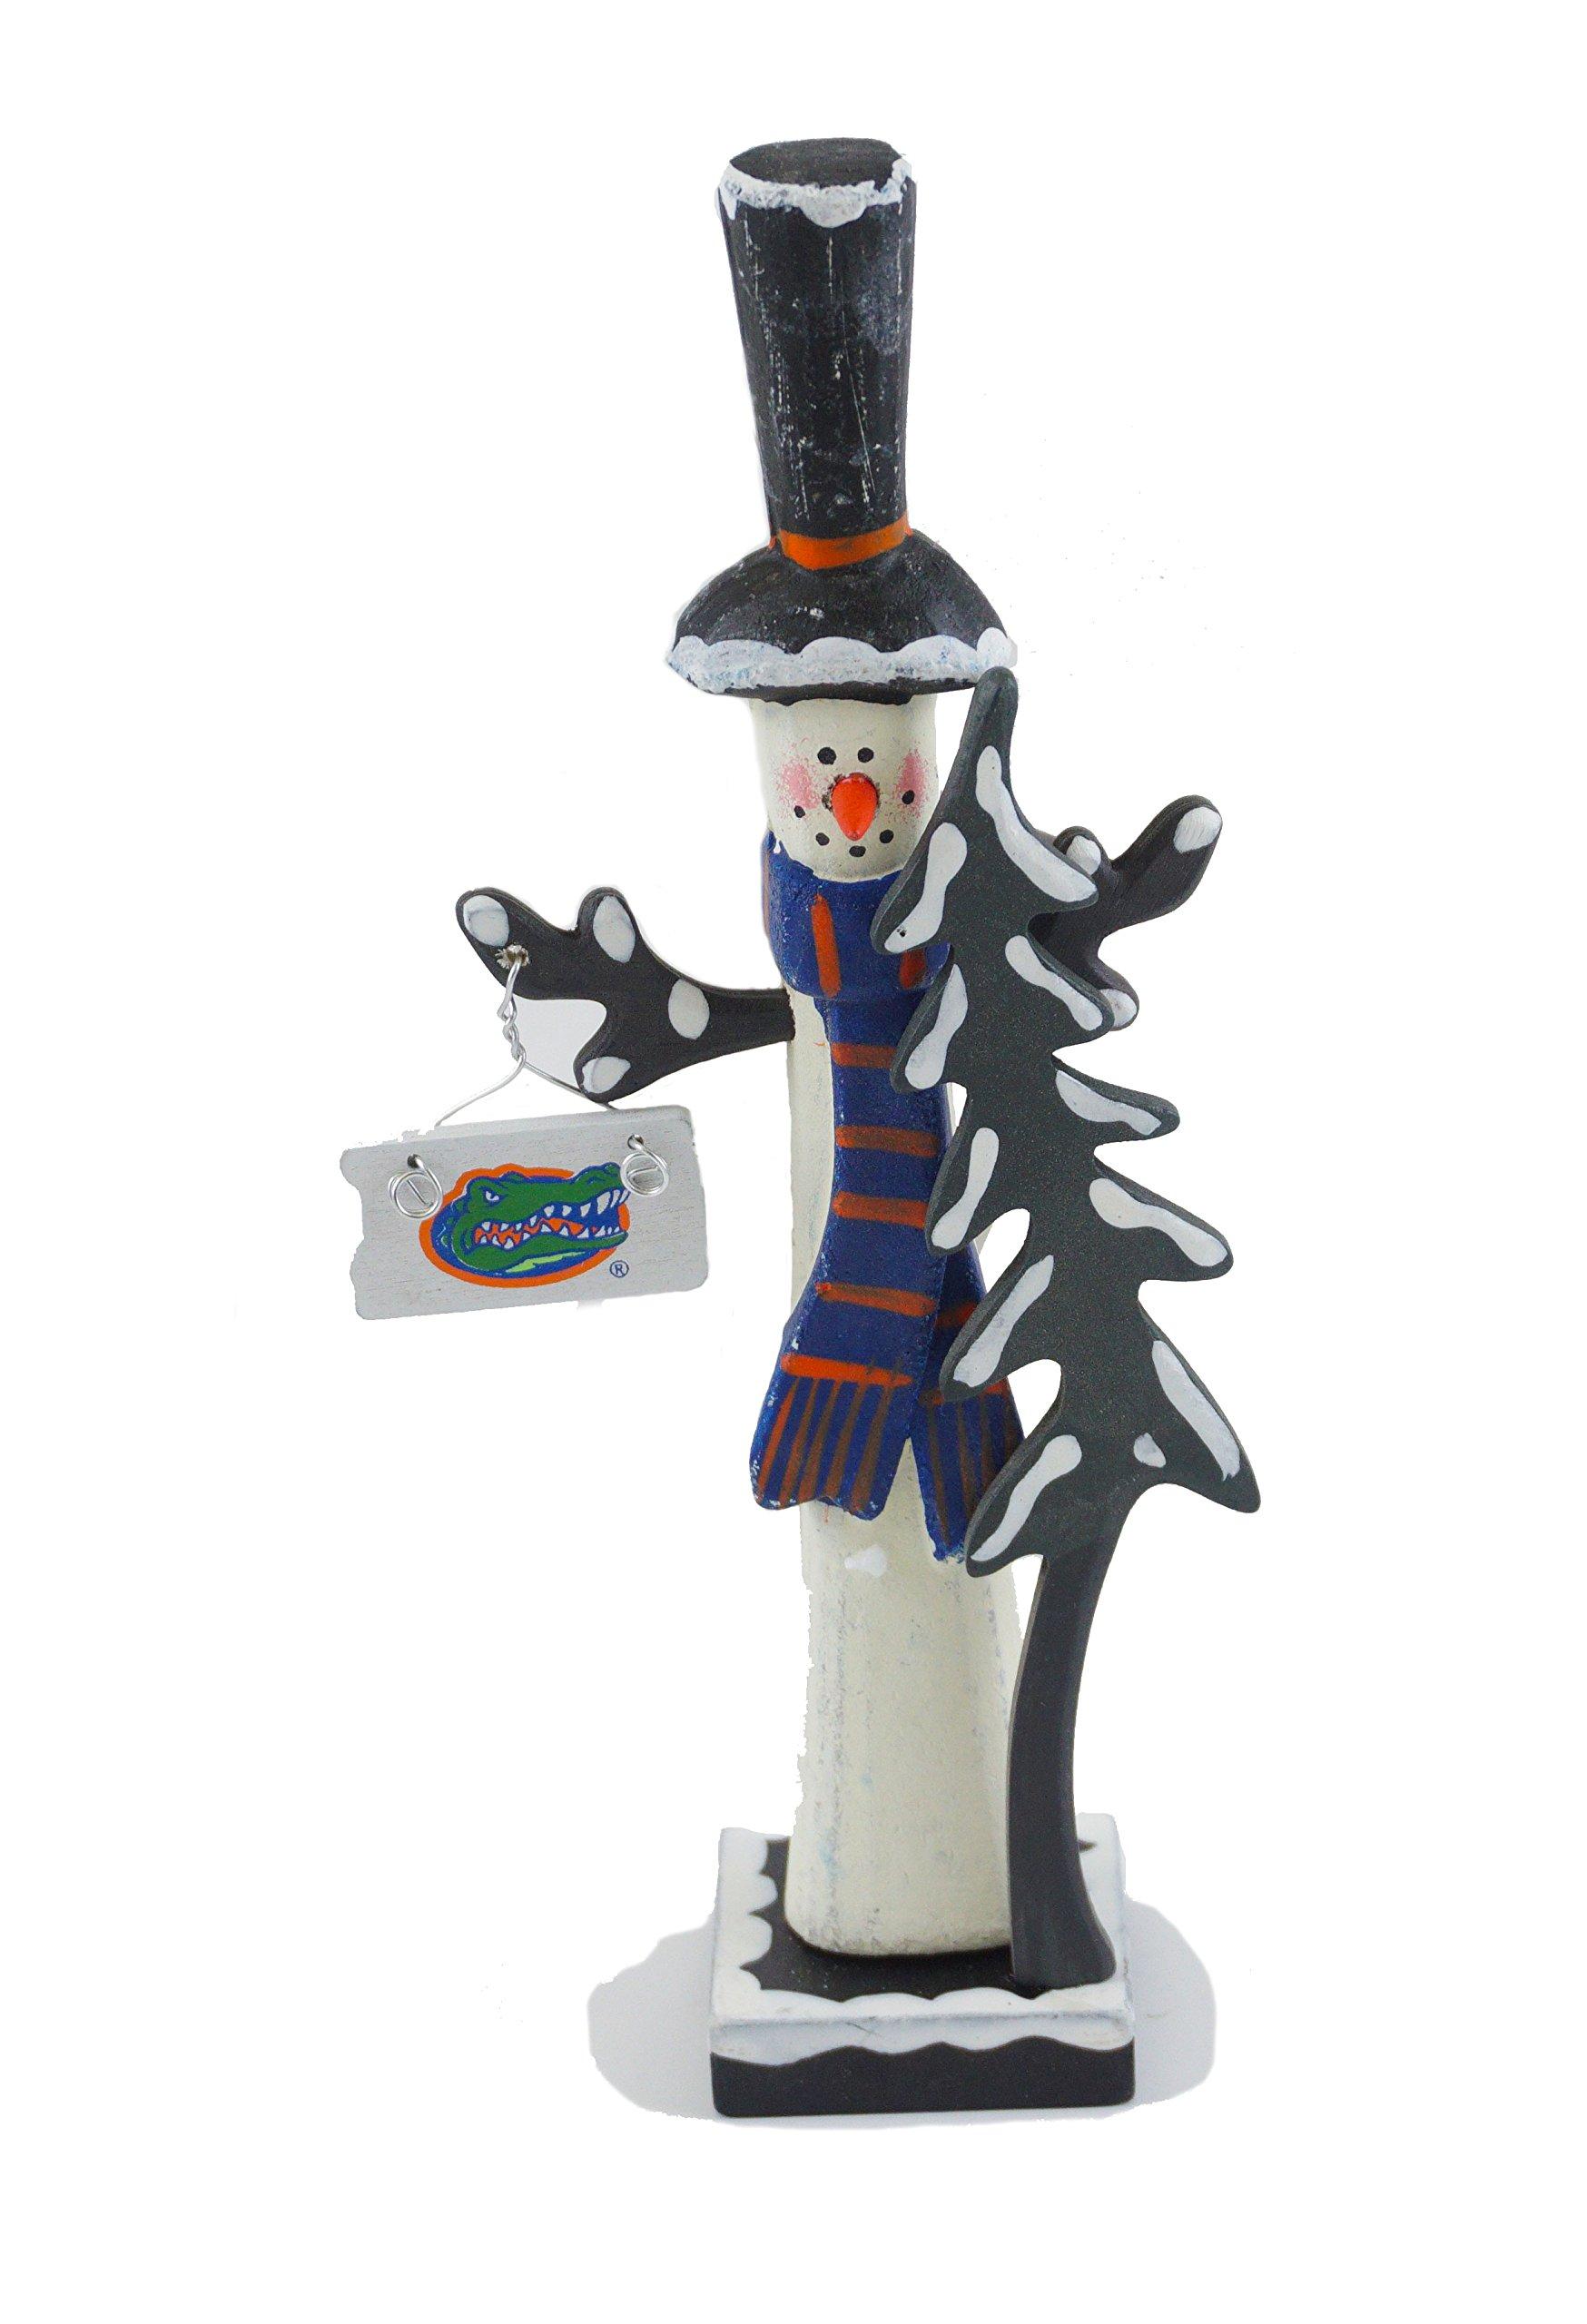 Hanna's Handiworks University of Florida Snowman Figurine (Top Hat)